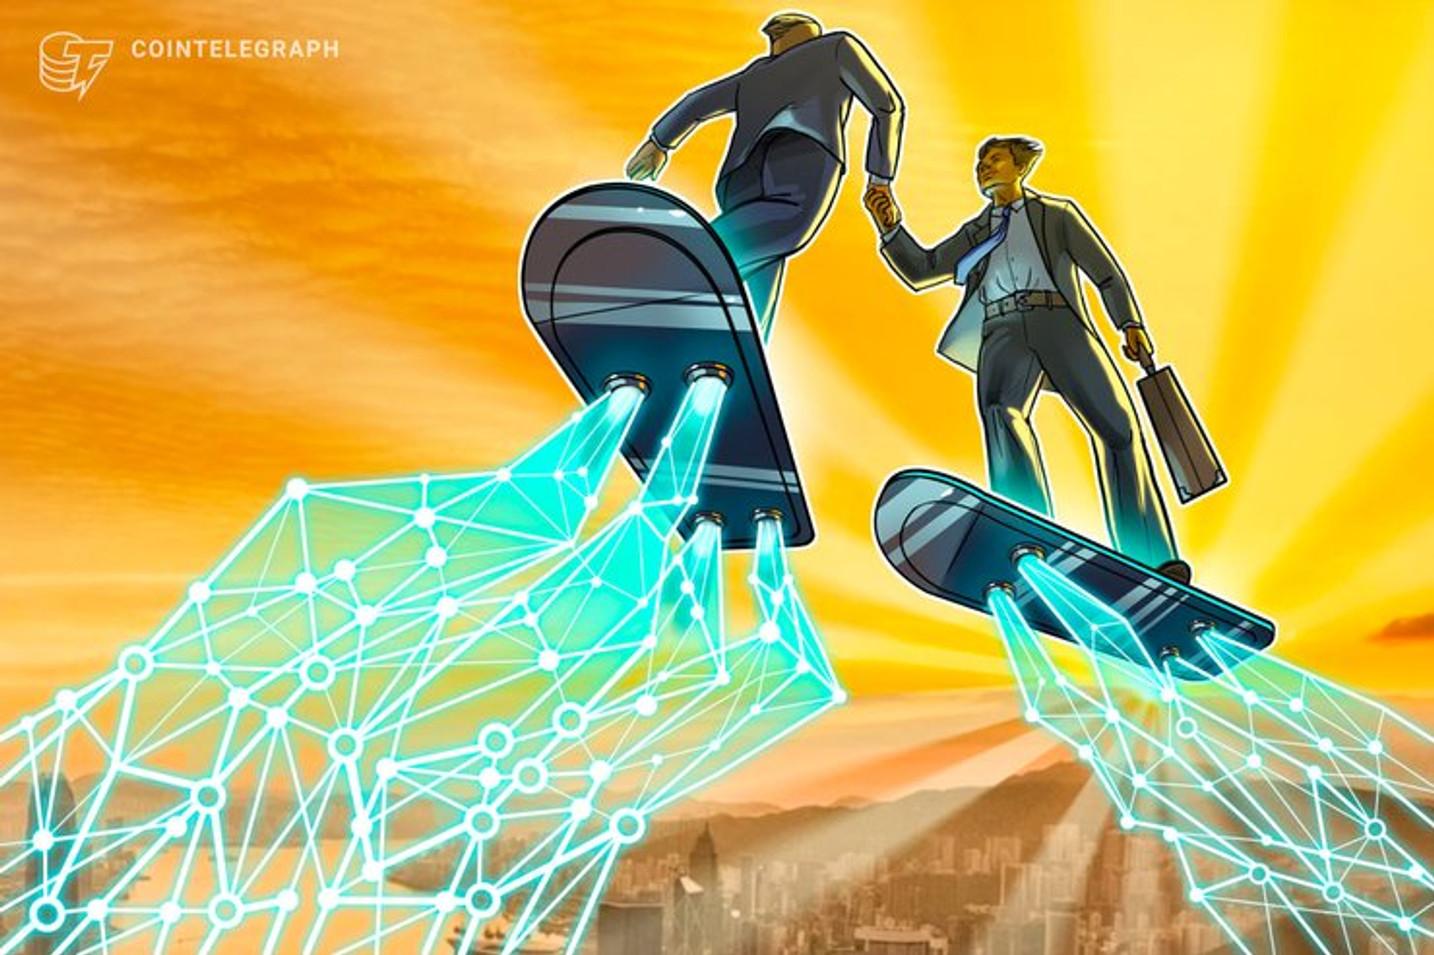 gumi Cryptosが分散型ビデオストリーム開発のTheta Labsと提携 日本市場への進出を支援